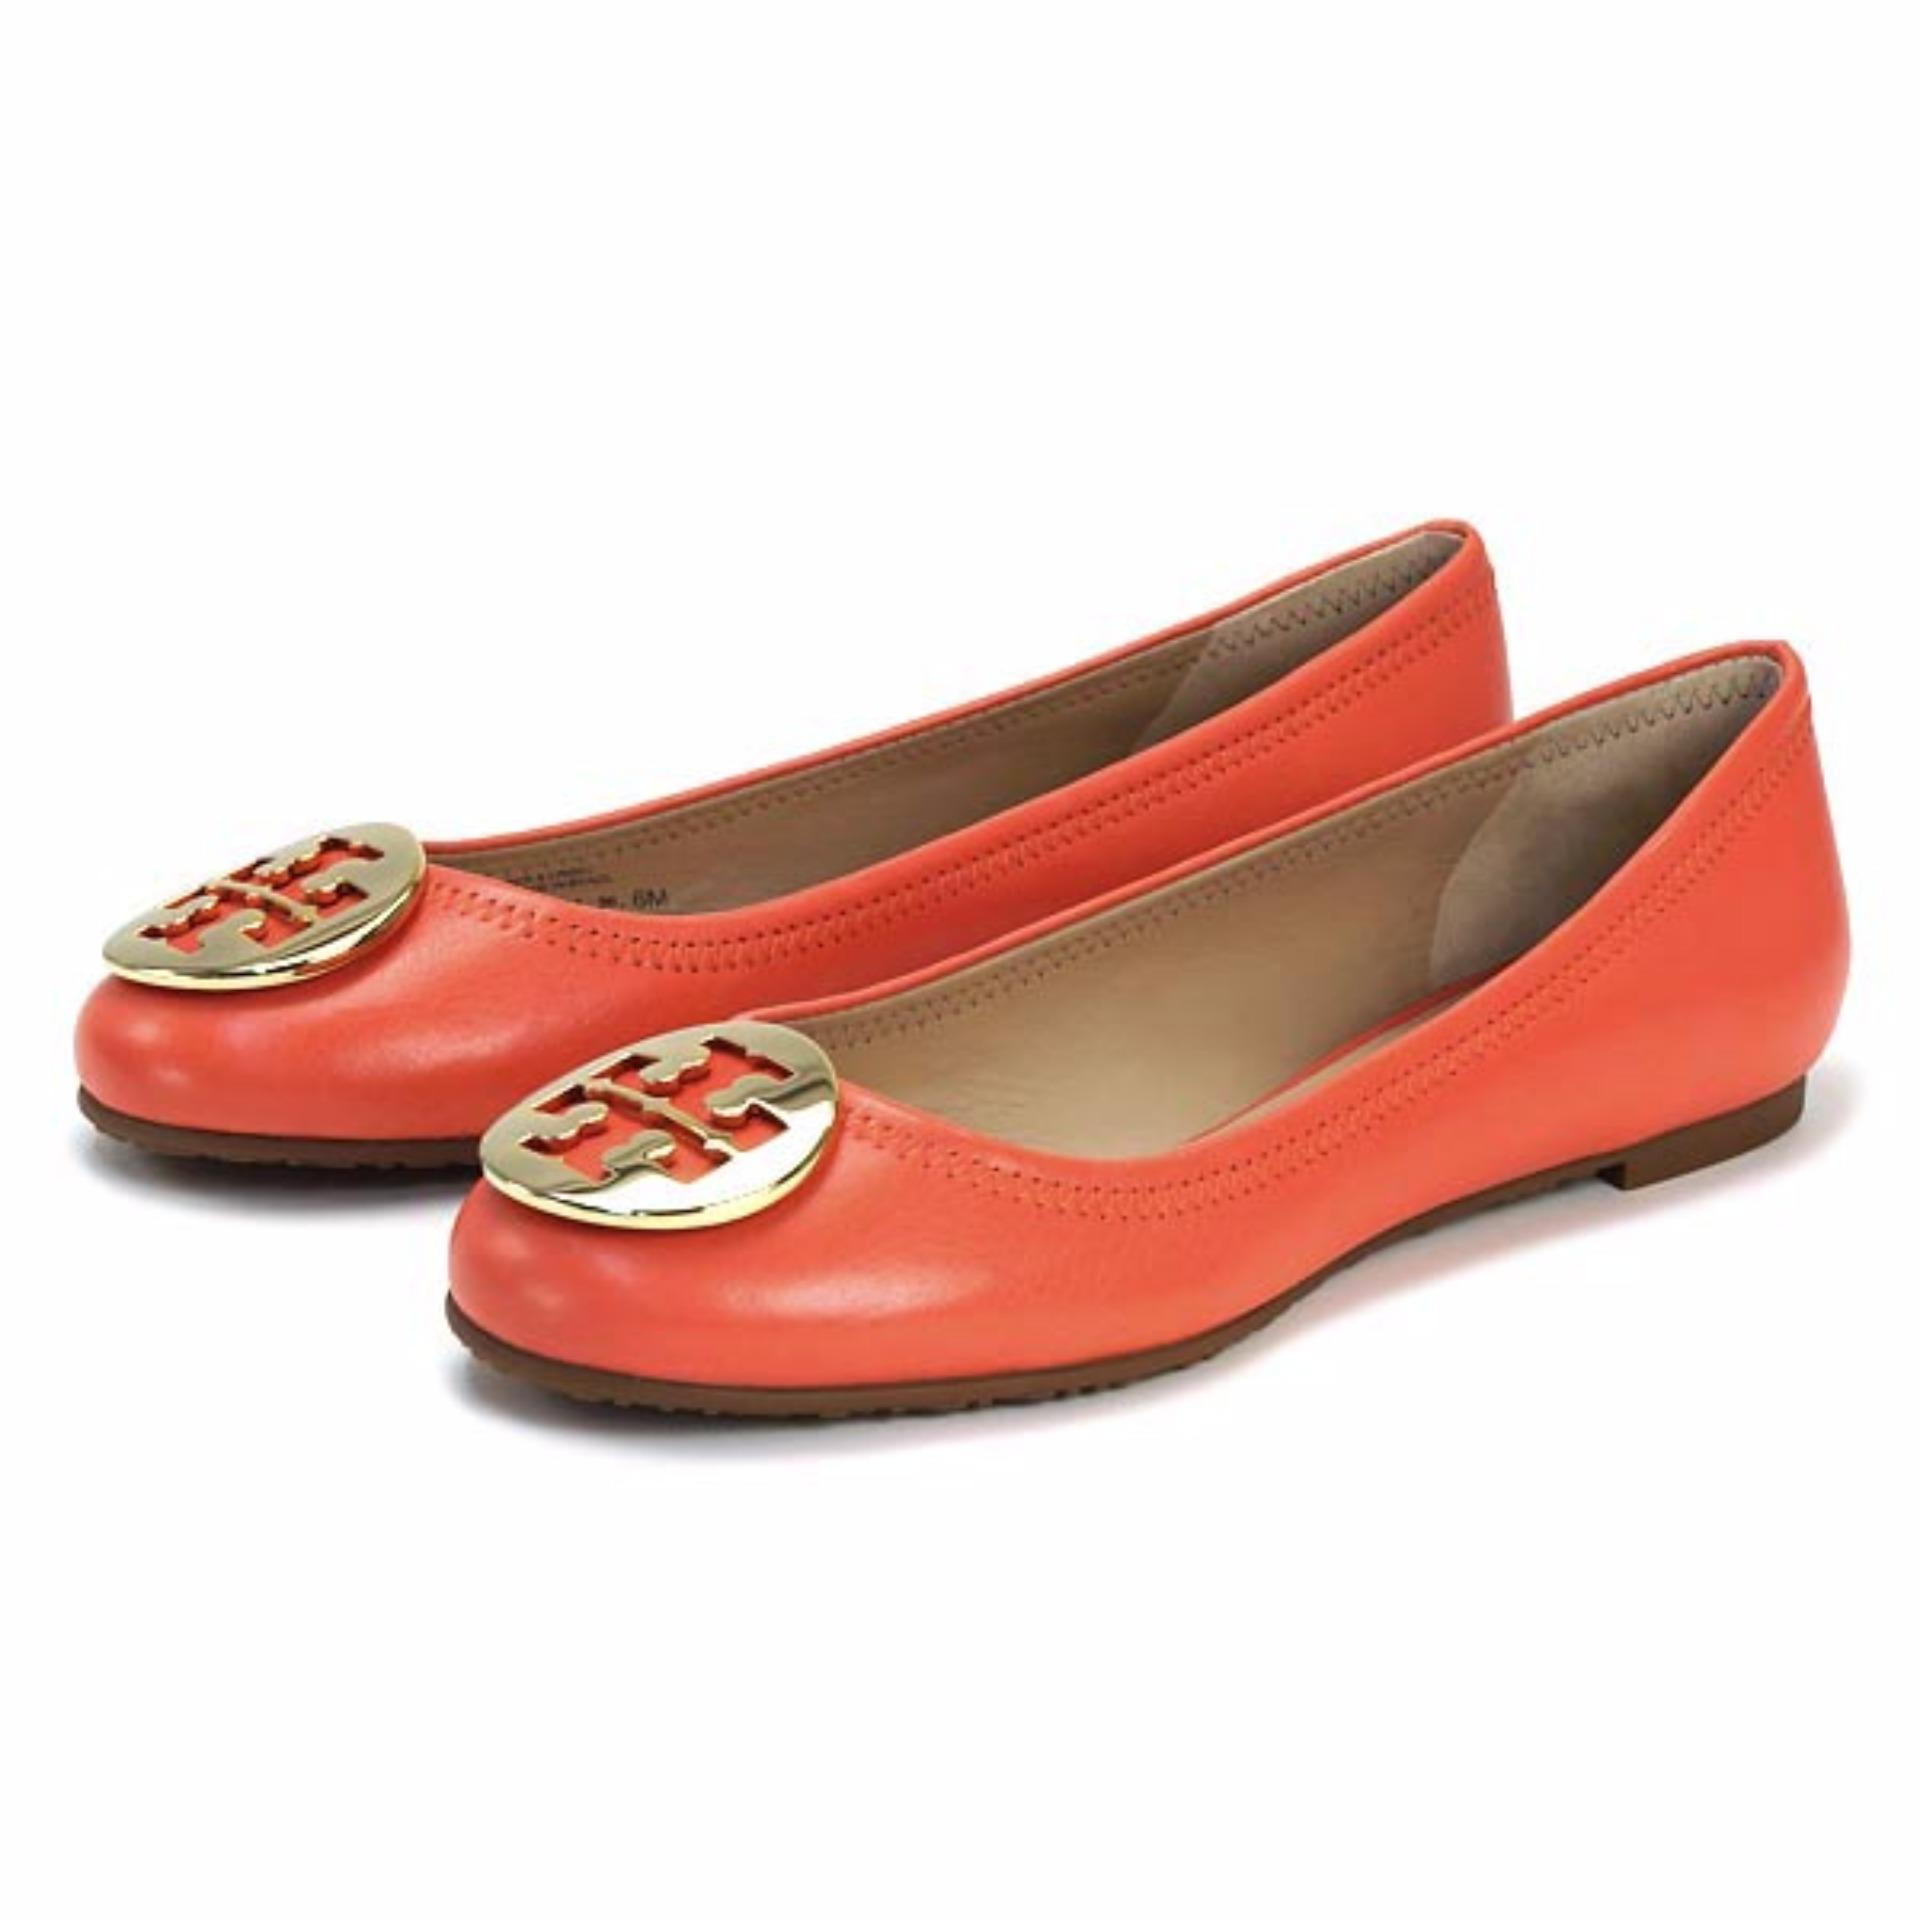 0697b484038b8b ... canada tory burch flats ballet shoes reva ballet flat coral gold coral  singapore f95a4 37586